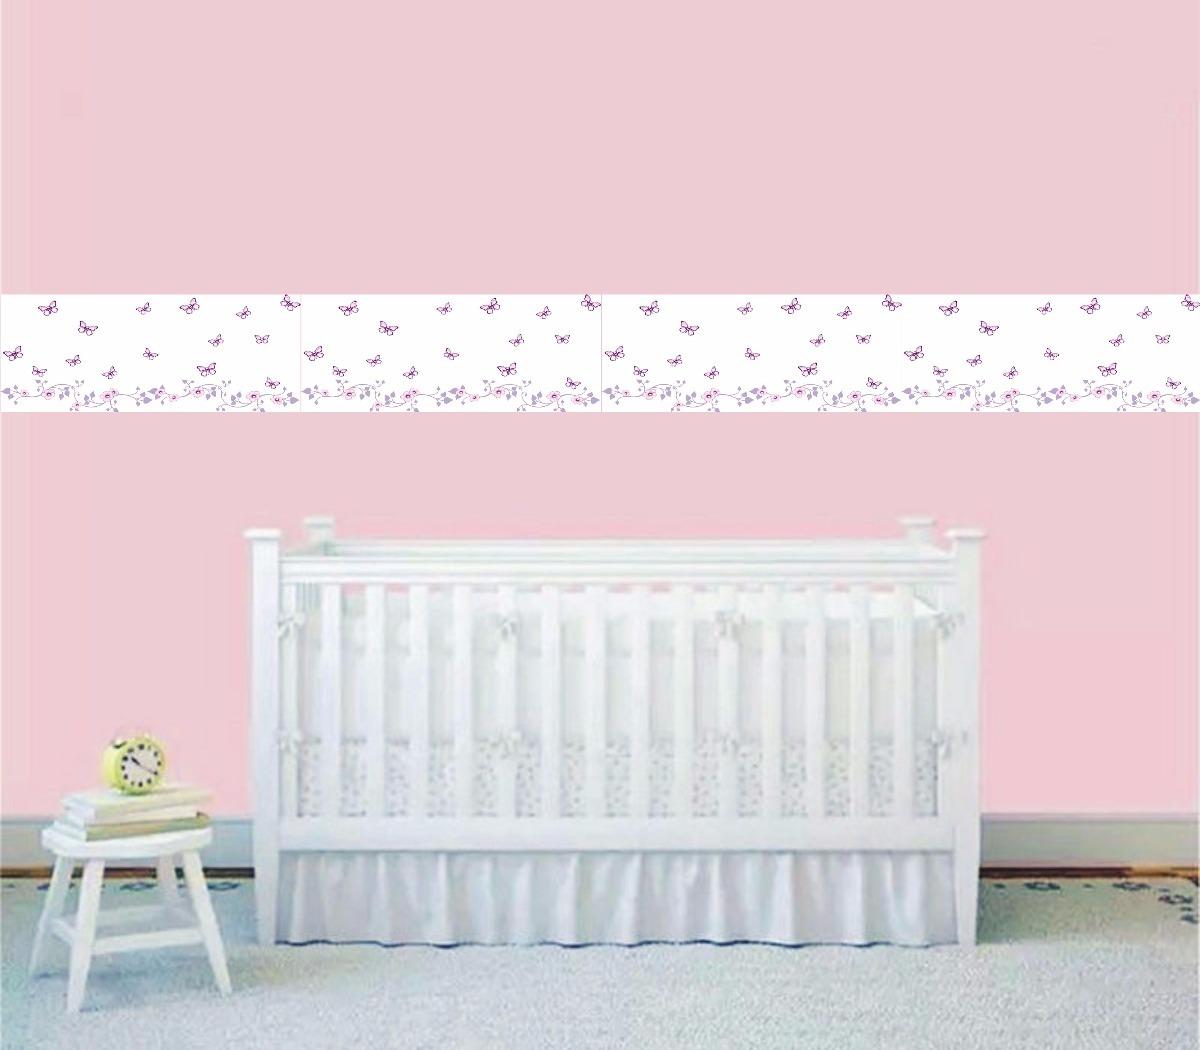 e59305a4b faixa decorativa adesivo border infantil borboleta. Carregando zoom.